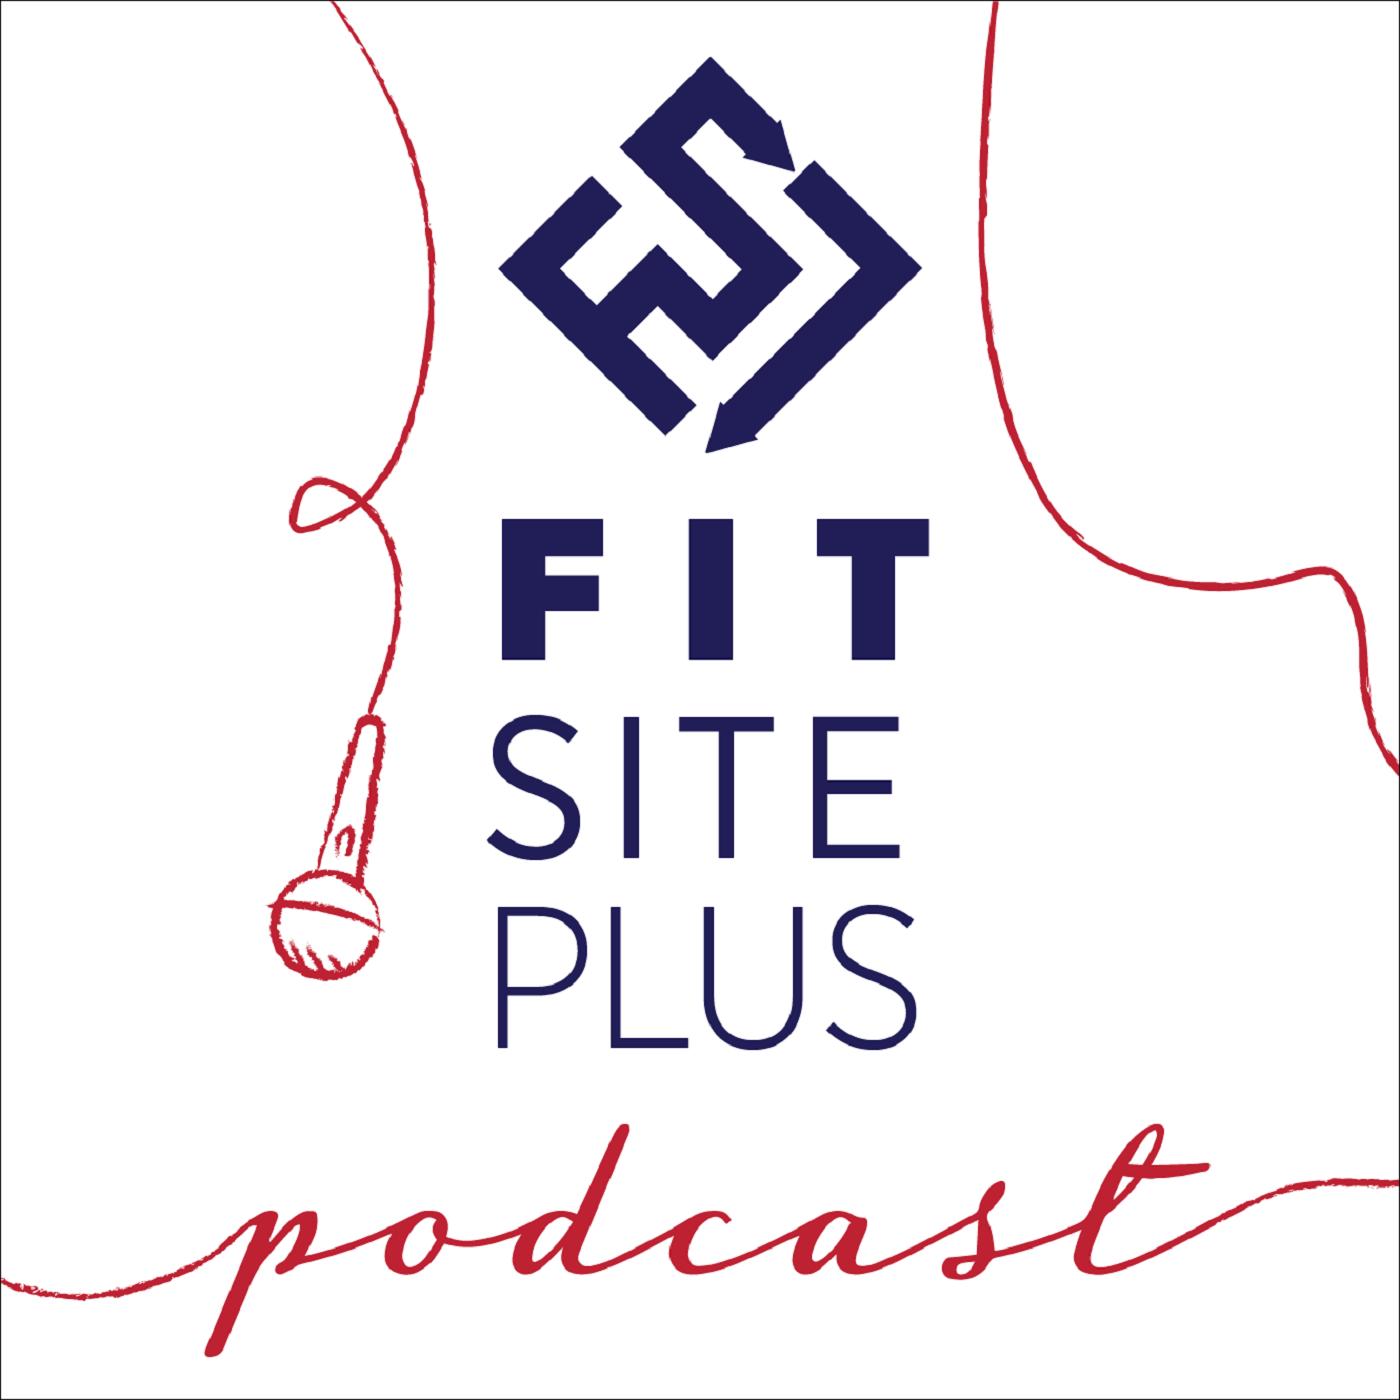 FitSitePlus Audio, a www.primalpattons.com blog